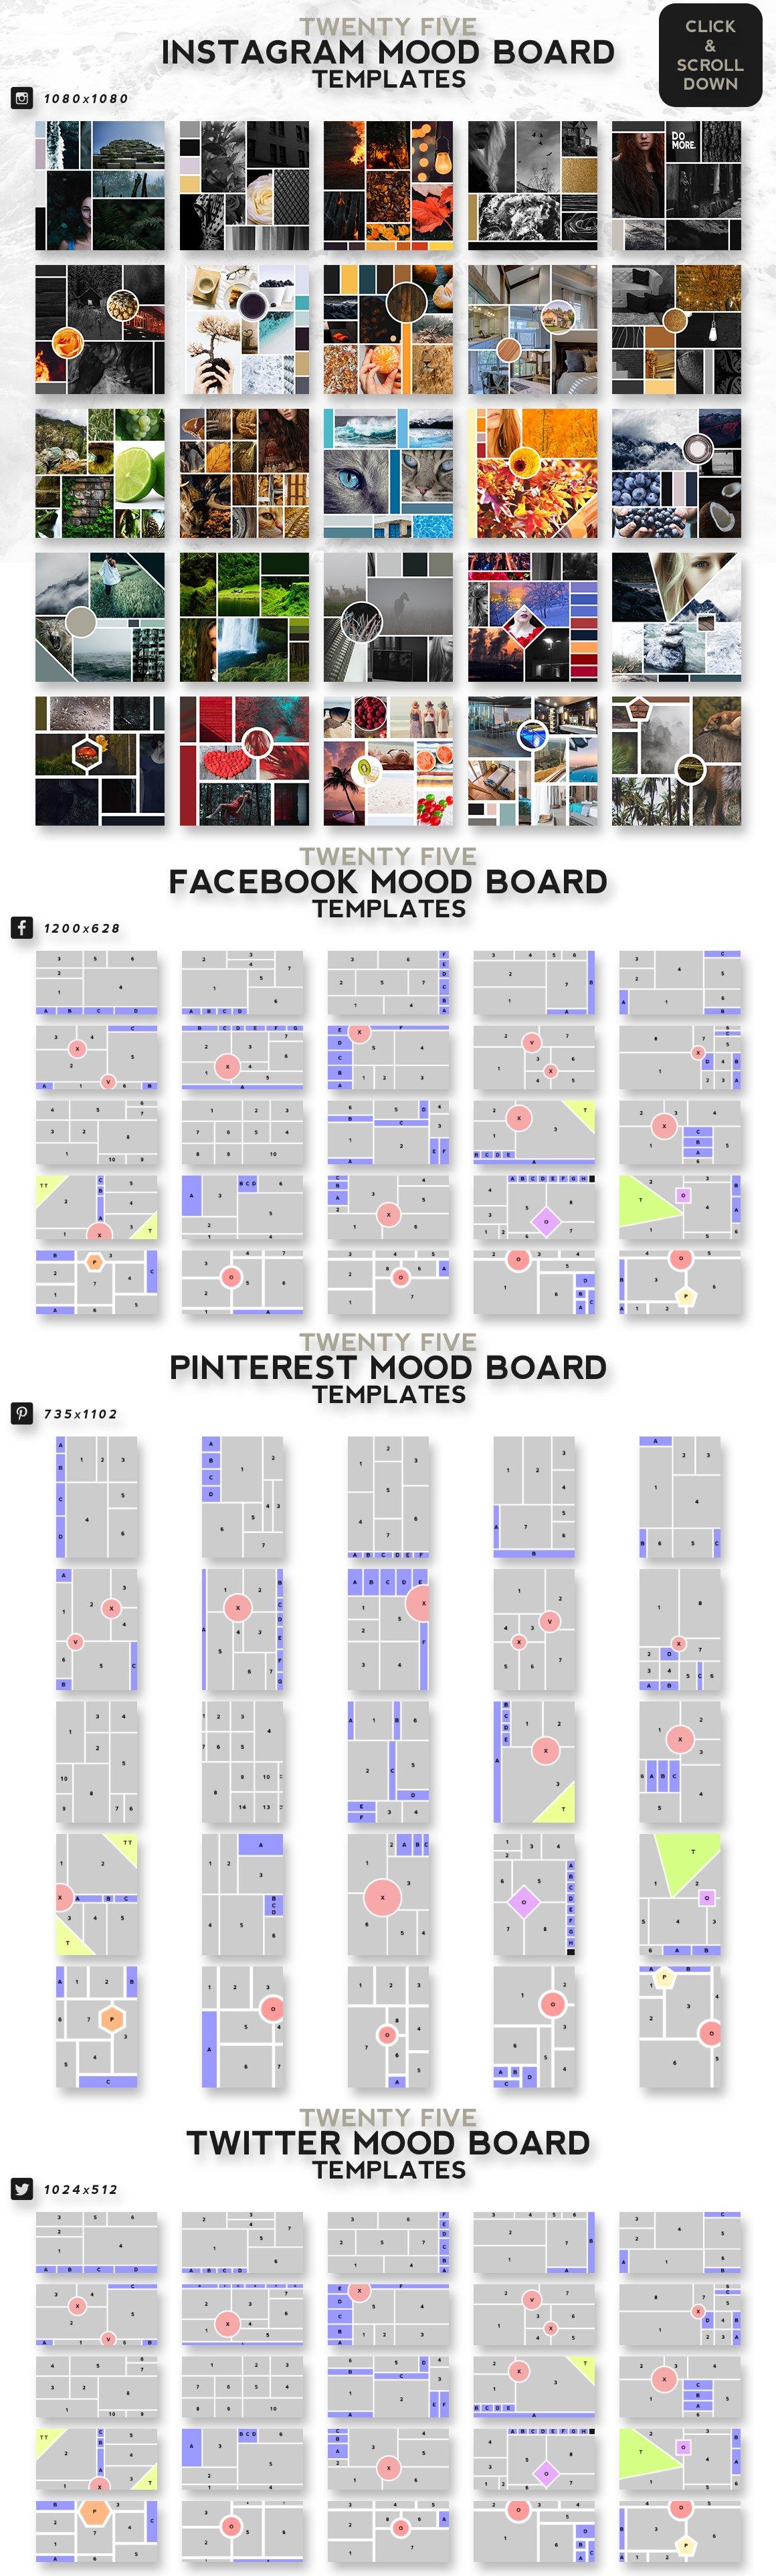 25 Mood Board Templates